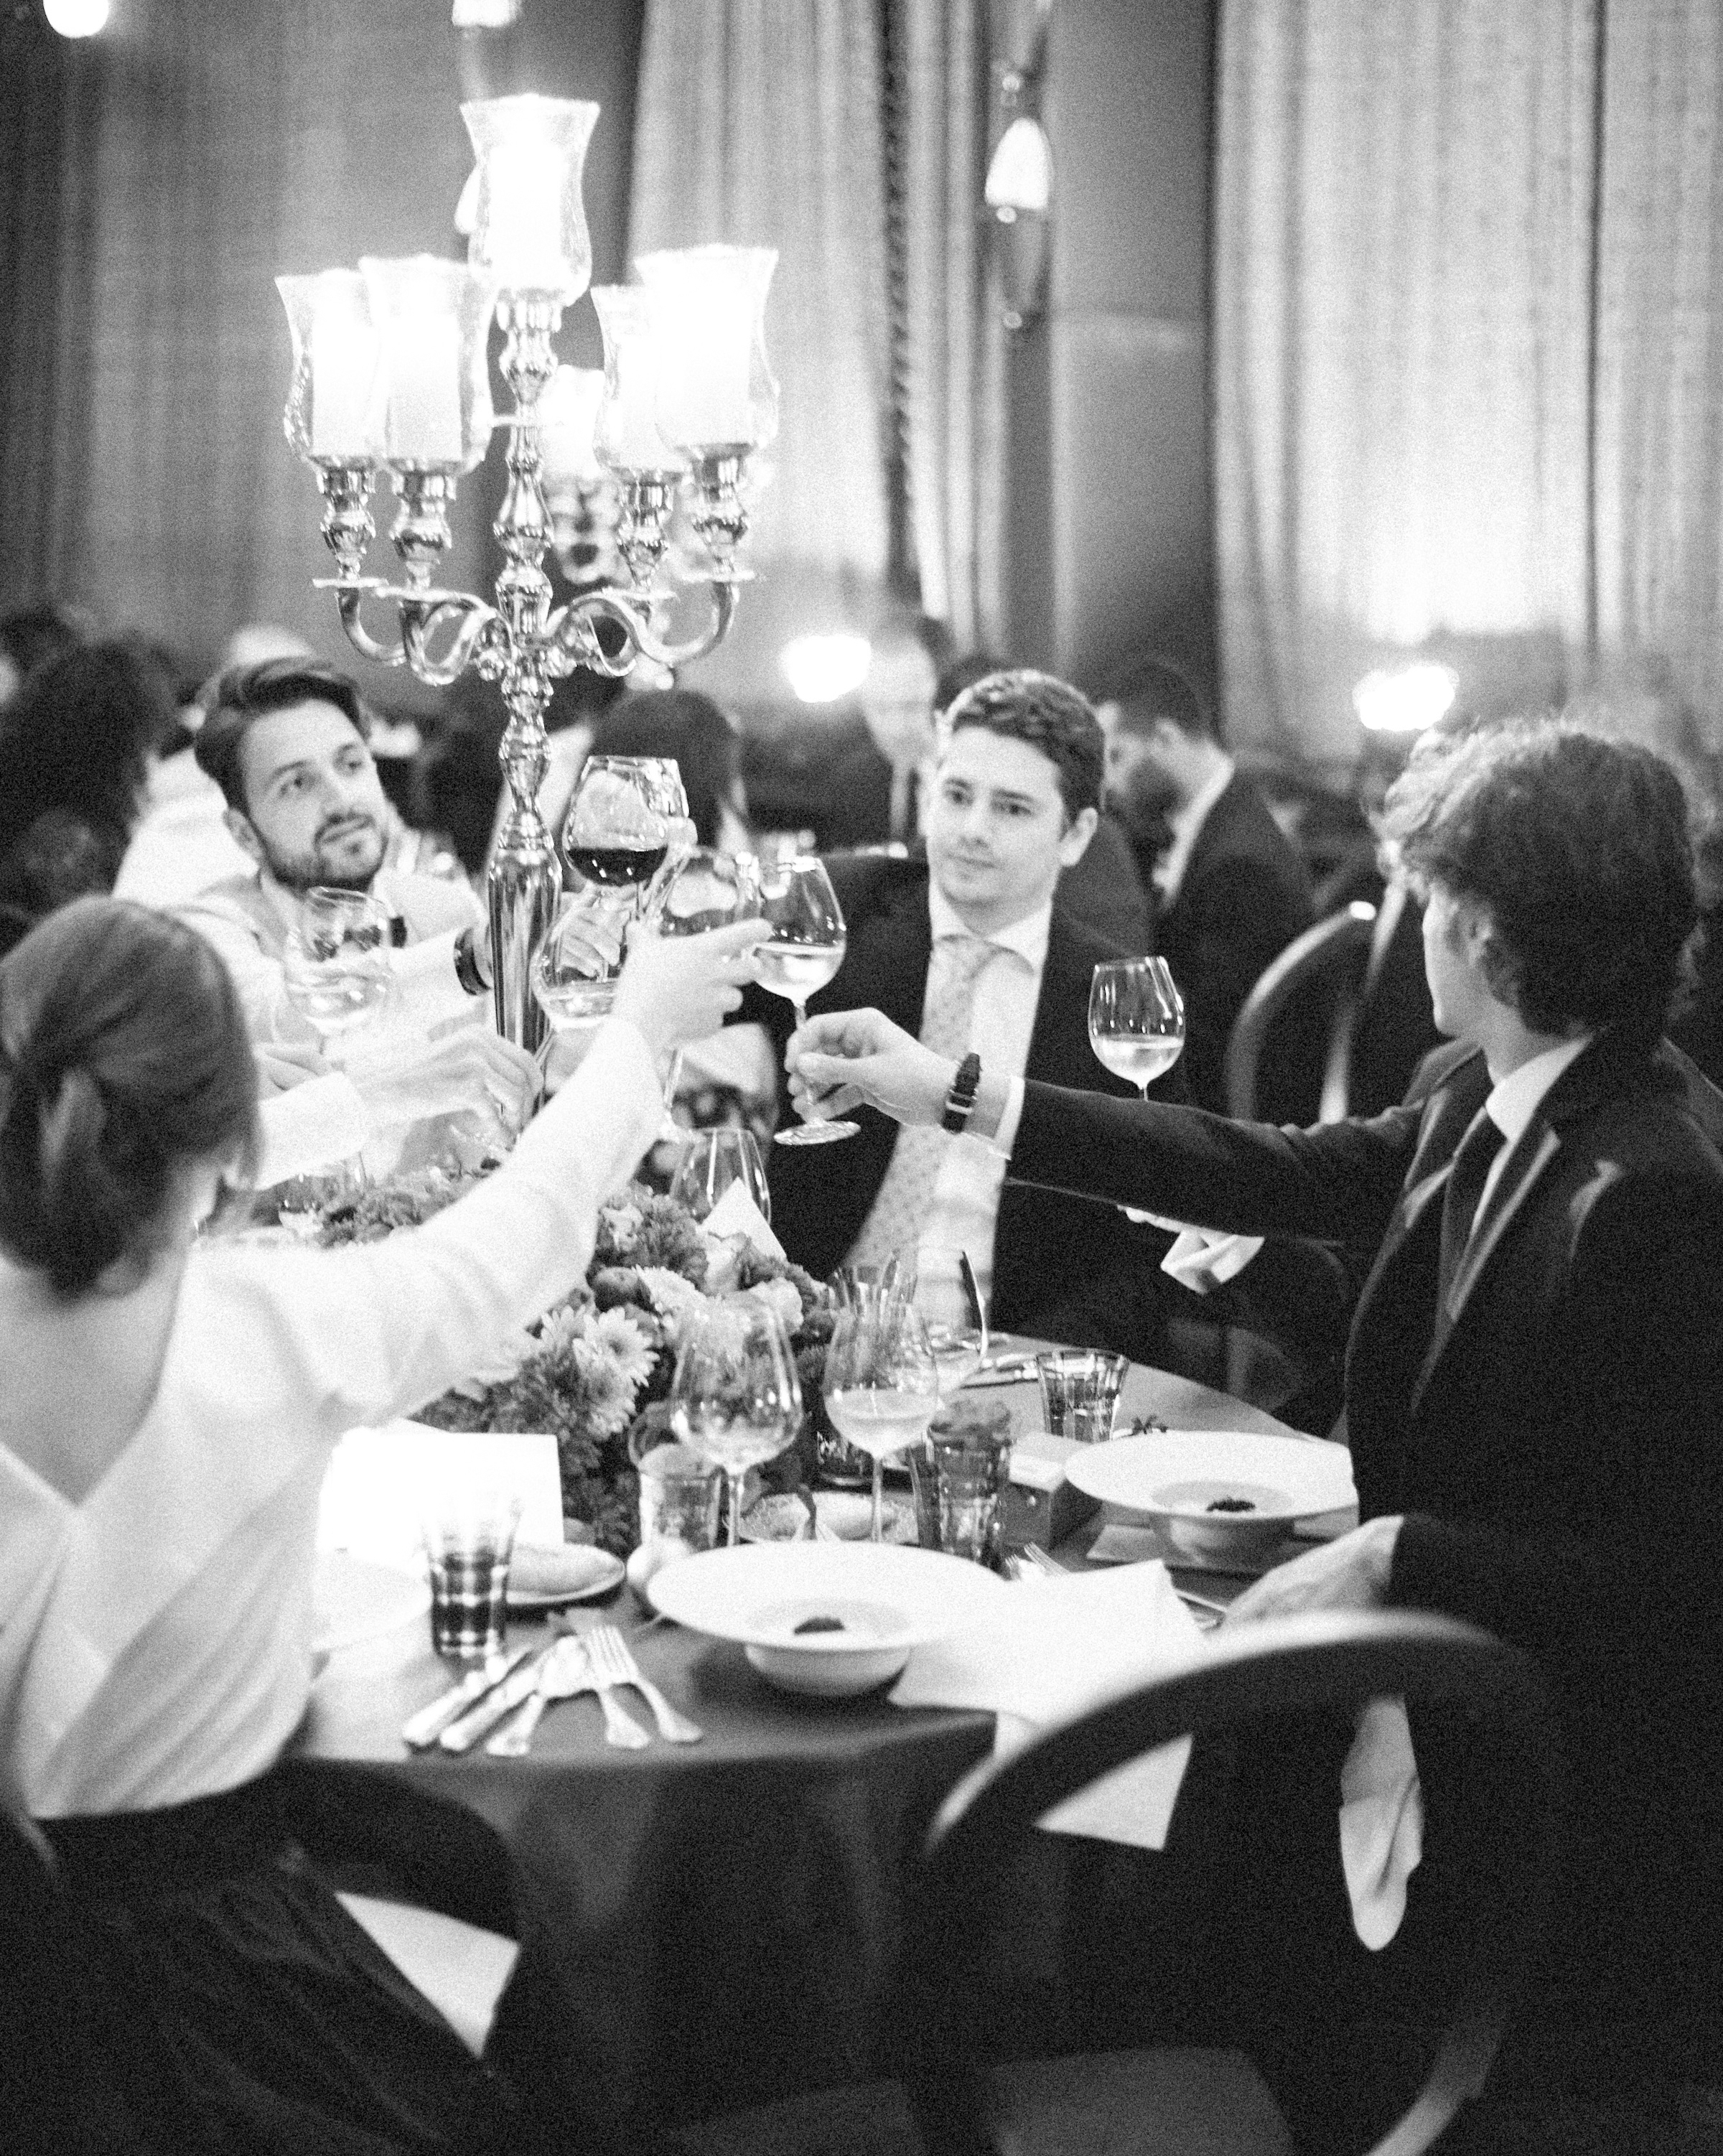 federica-tommaso-wedding-toasts-117-s112330-1015.jpg